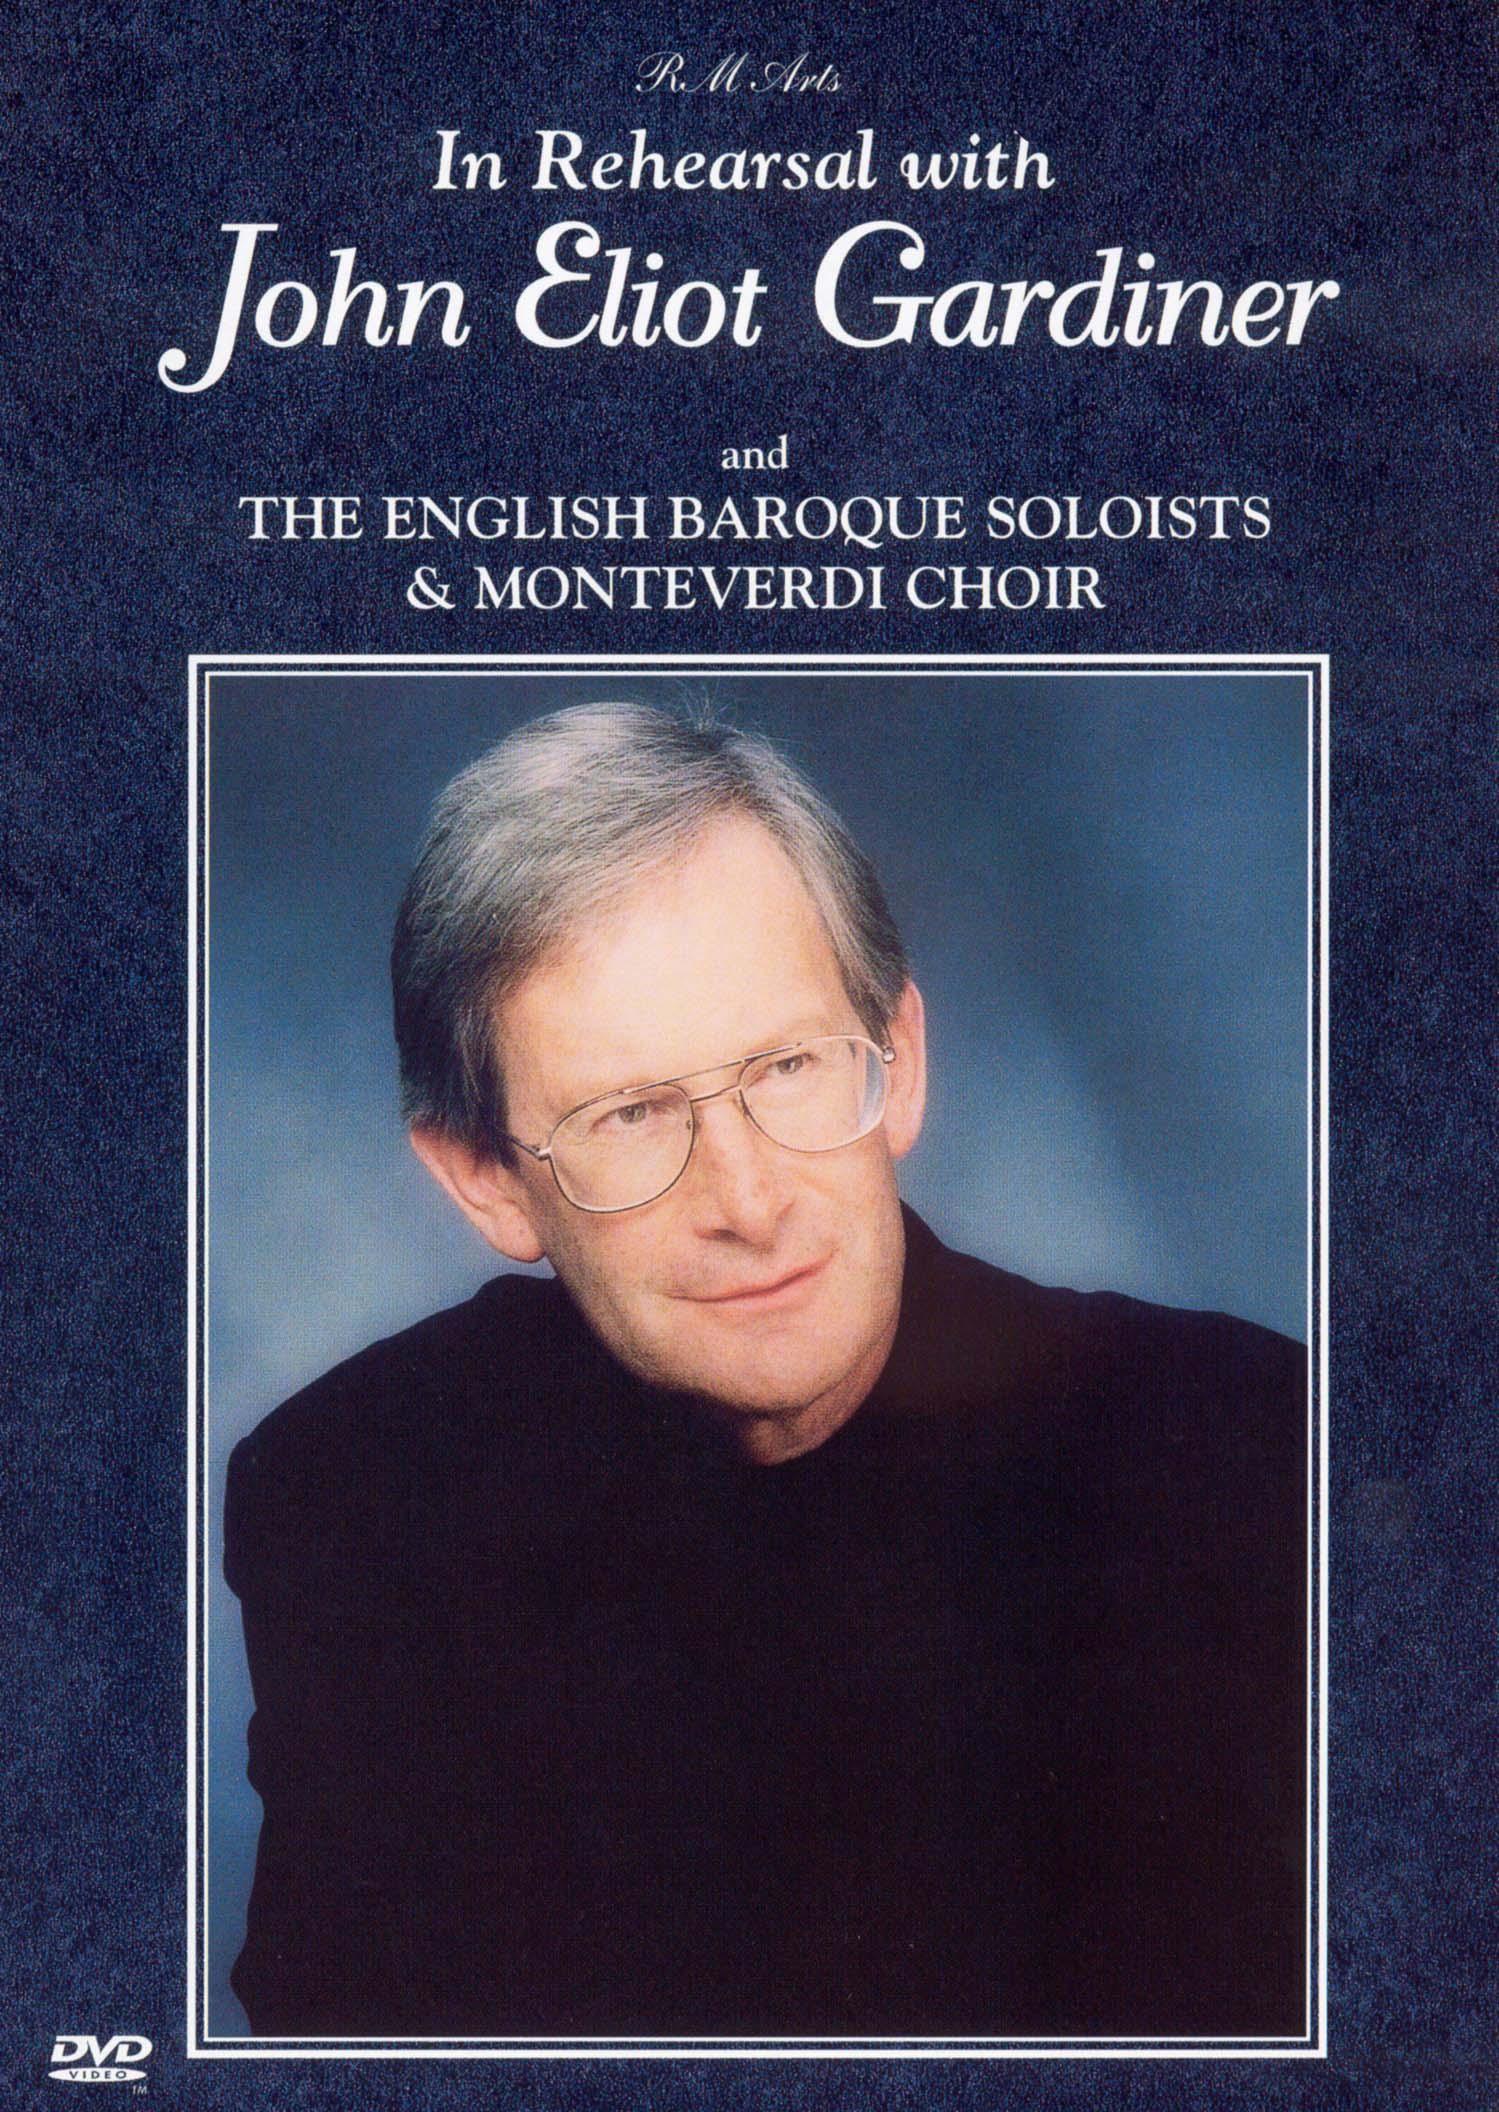 In Rehearsal With John Eliot Gardiner and the English Baroque Soloists & Monteverdi Choir